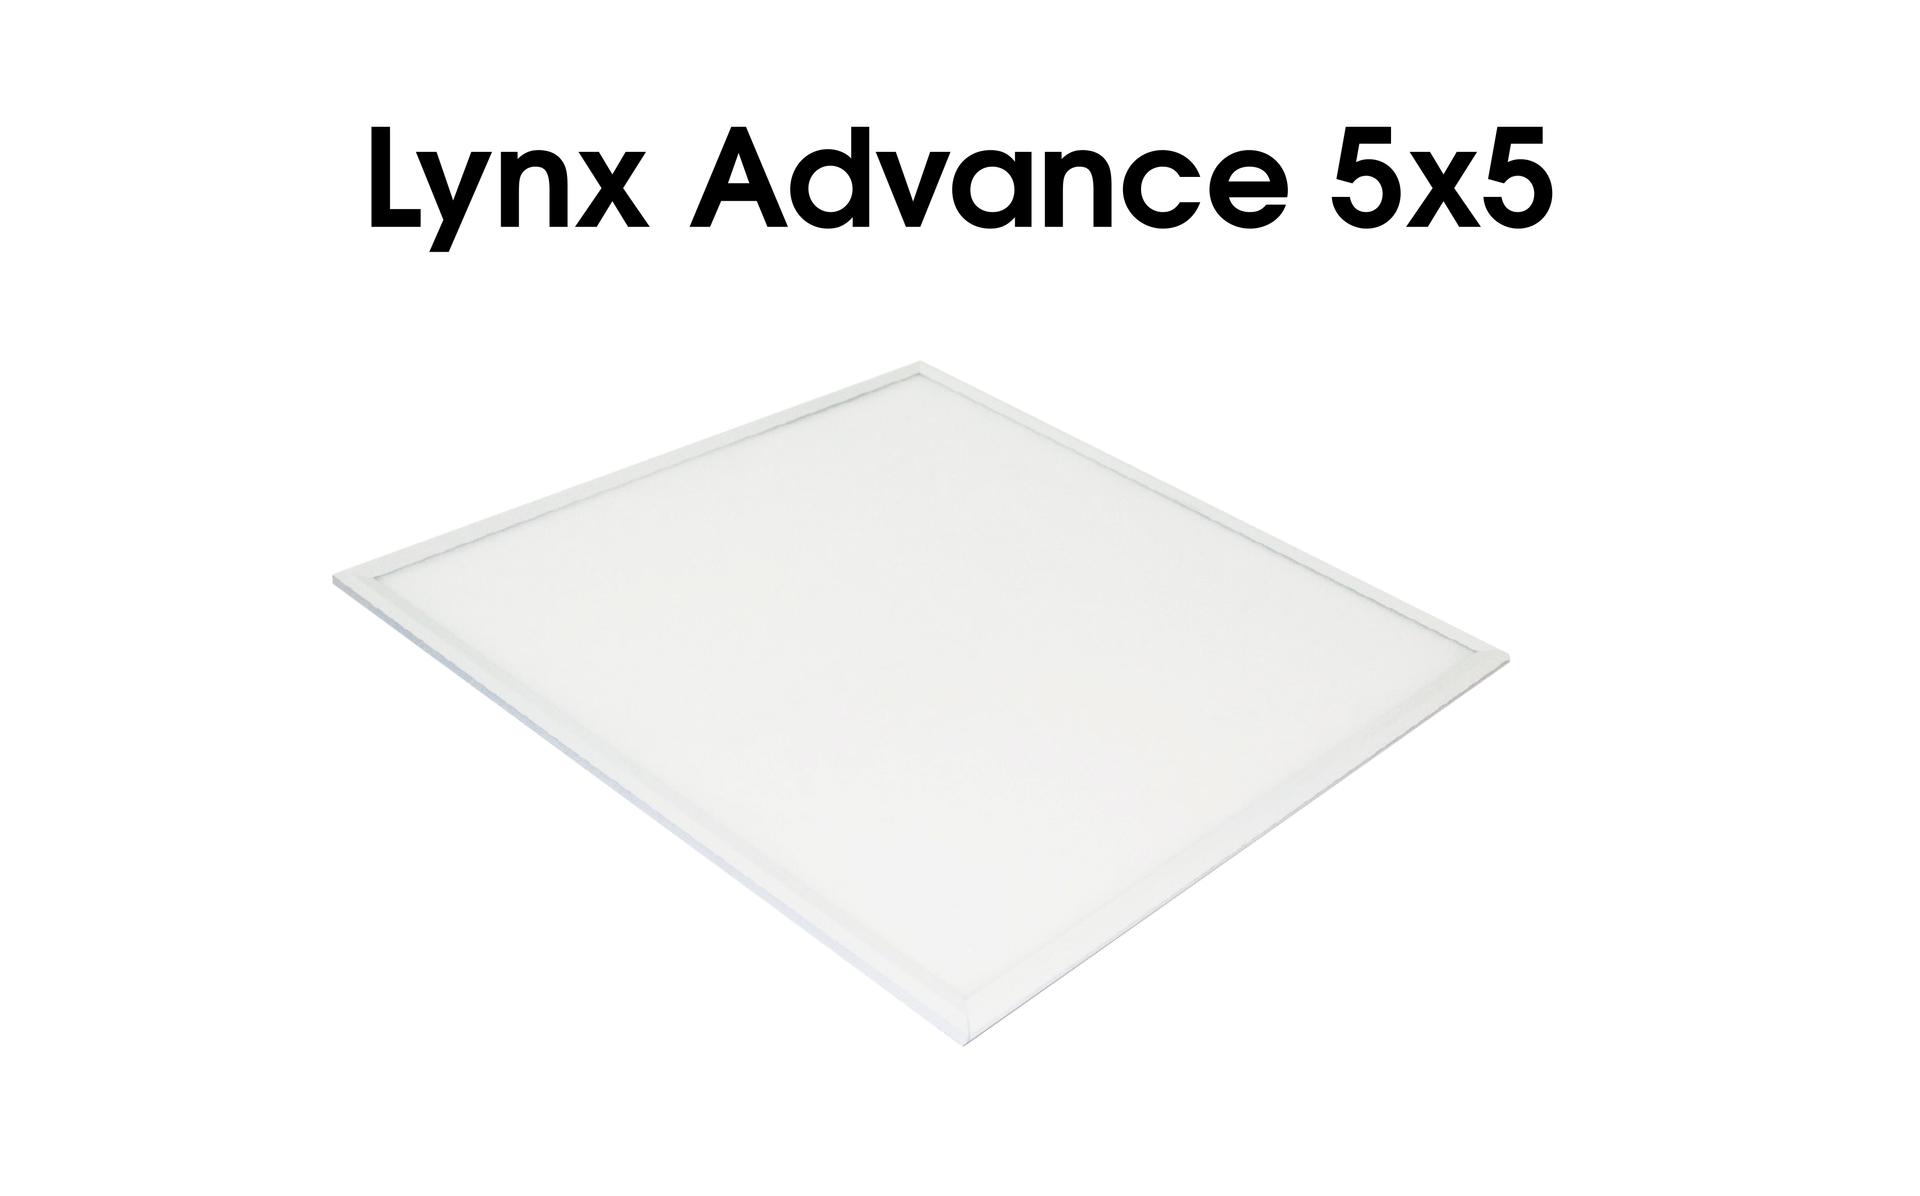 Lynx Adv 5x5 Mobile-01.png